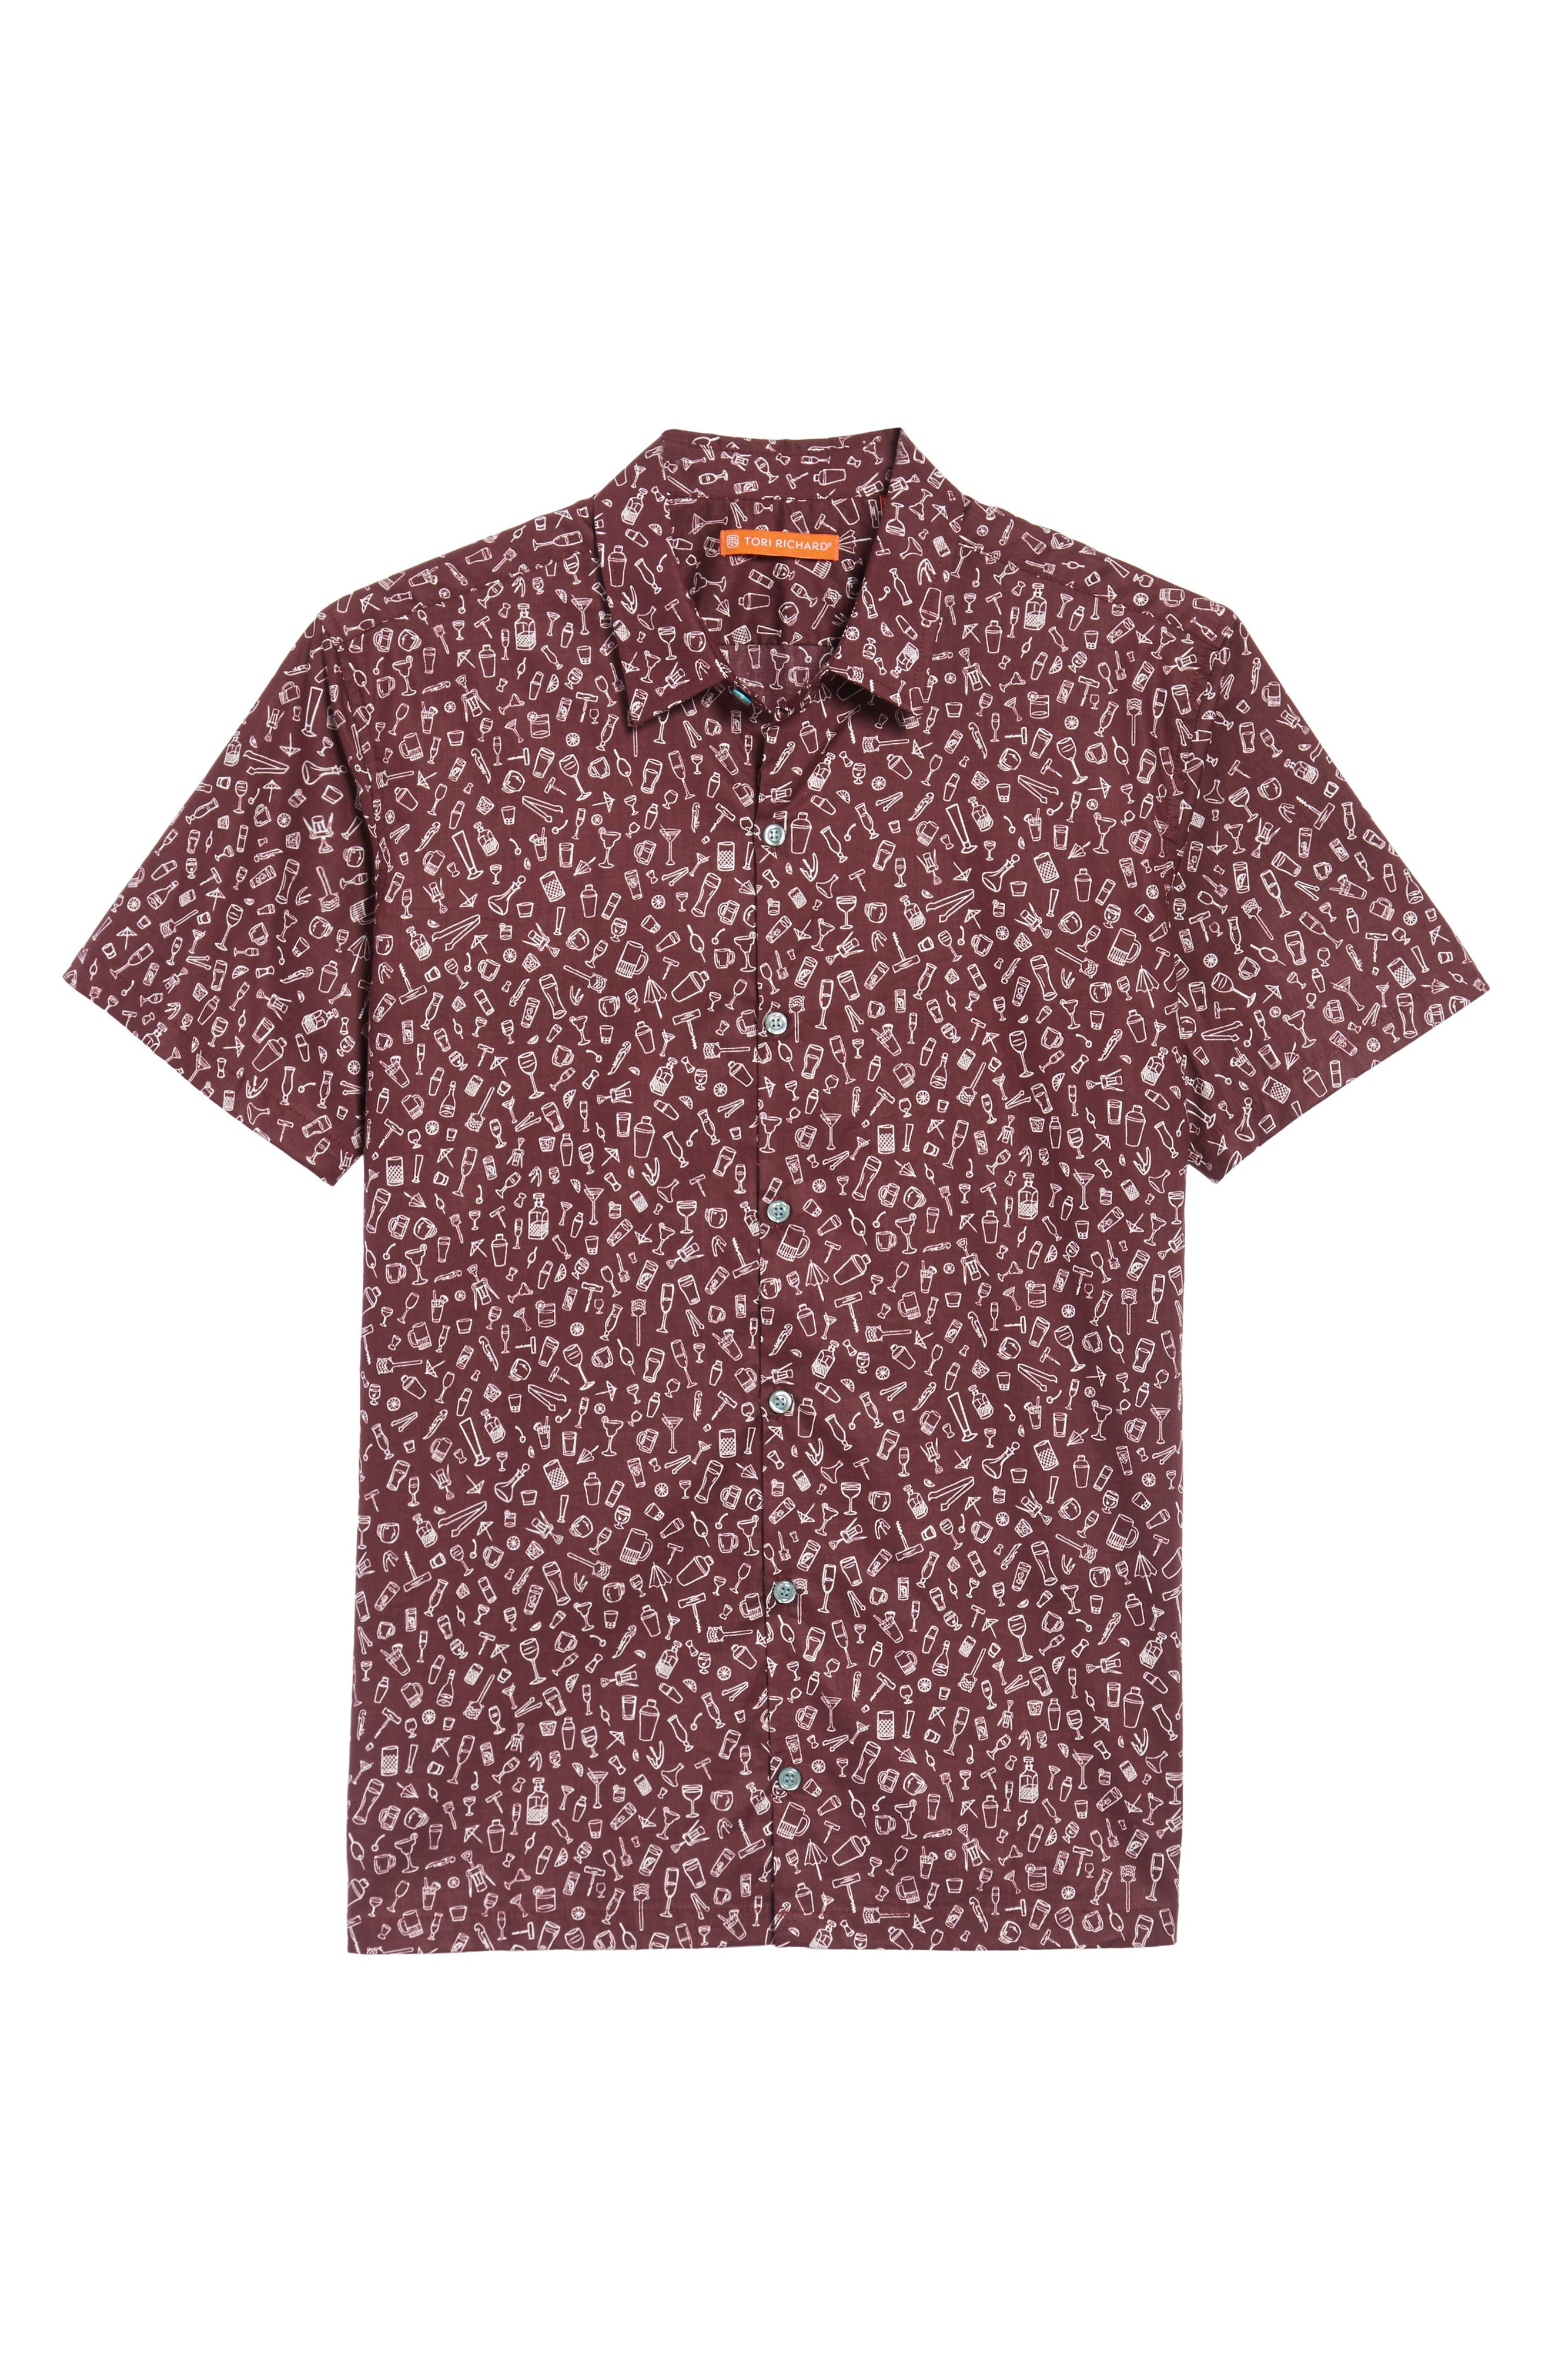 5 PM Slim Fit Camp Shirt,                             Alternate thumbnail 6, color,                             Wine